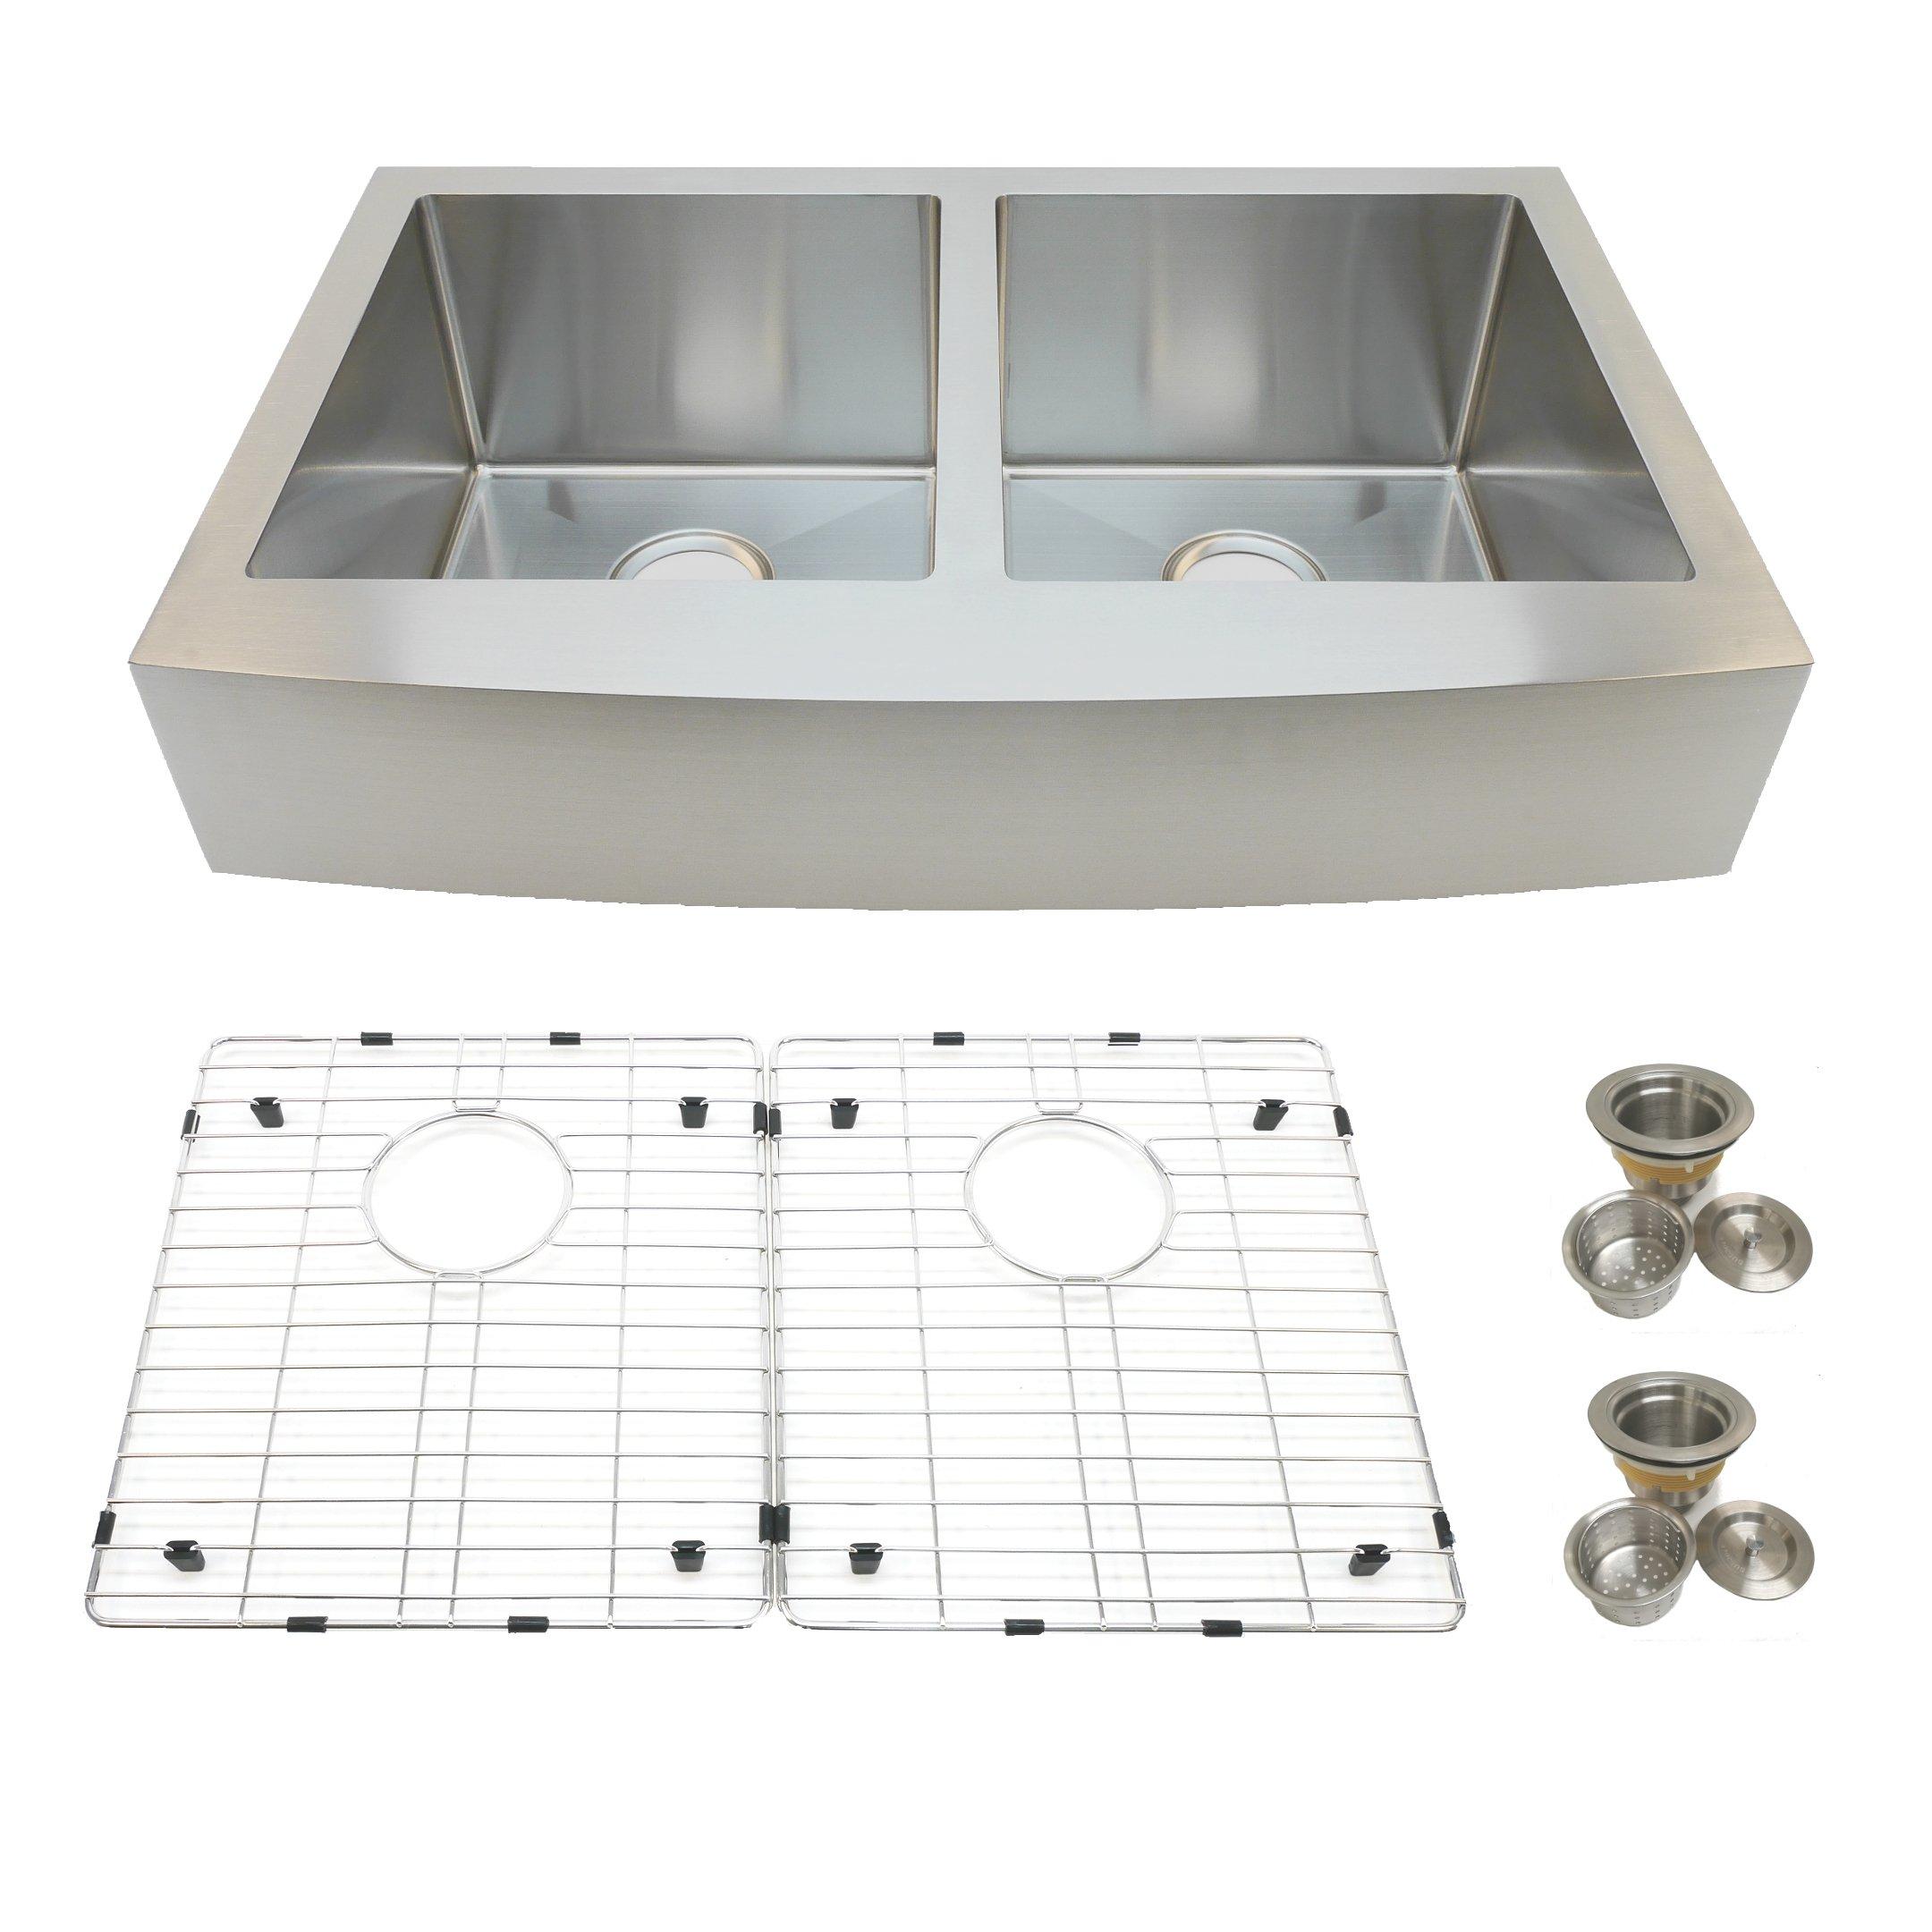 Auric Sinks 33'' Retro-fit Short 6'' Apron Farmhouse Curved Front Double 50/50 Bowl Sink, Premium 16-Gauge Stainless Steel, 6:SCAR-16-33-retro 5050